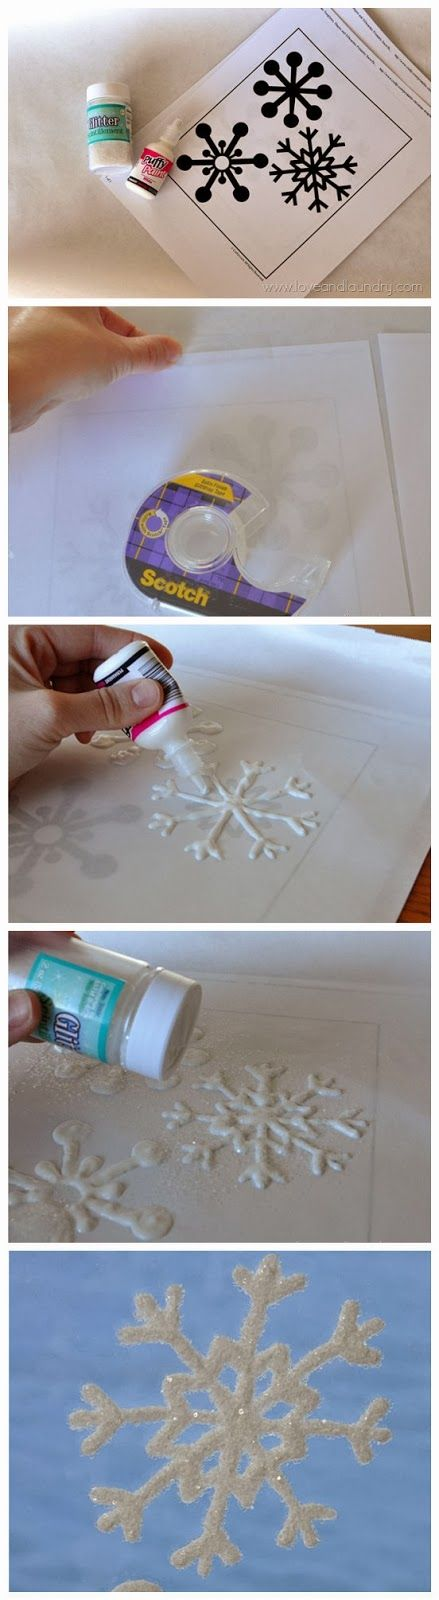 joybobo: DIY Glitter Snowflake Window Clings